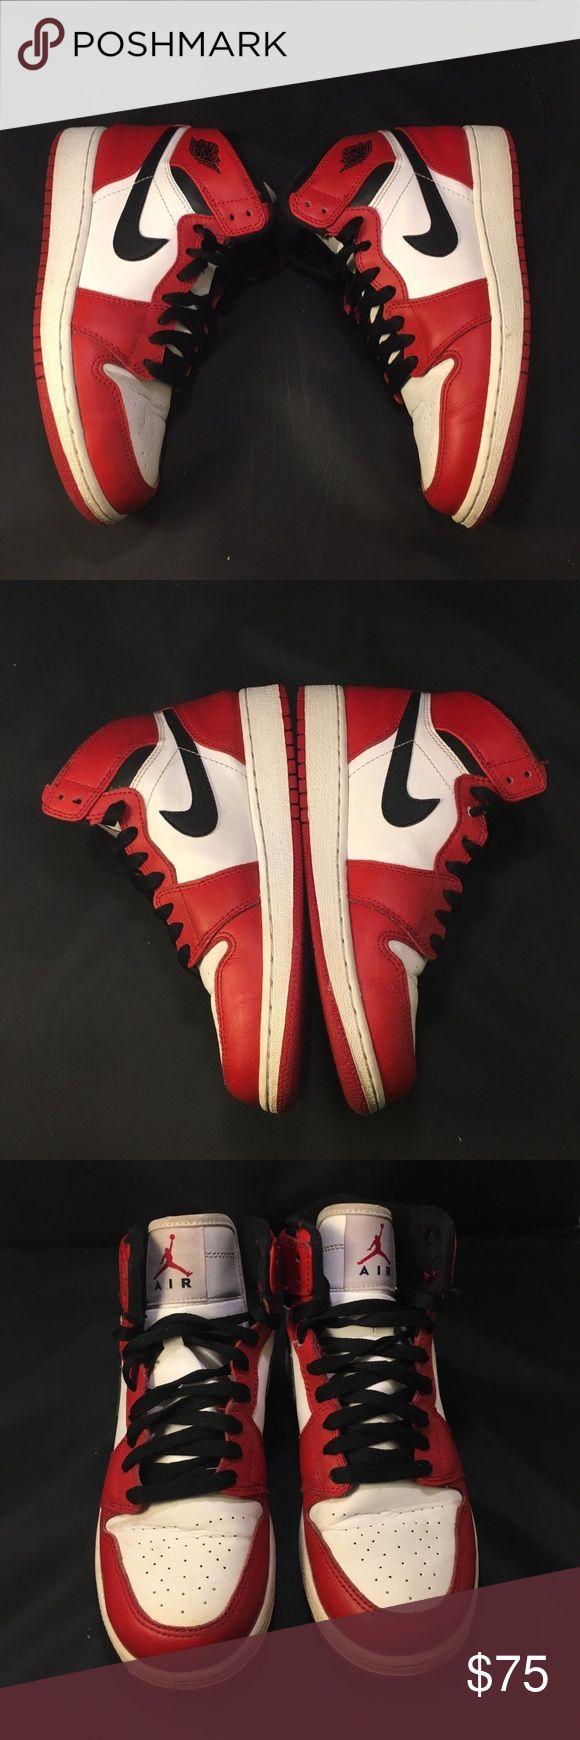 "2012 Air Jordan ""Bull"" Retro 1 Size 5y 100% Authentic  Preowned 2012 Release Jordan Bull 1s Comes In a replacement box  Great basketball sneakers Air Jordan Shoes Sneakers"